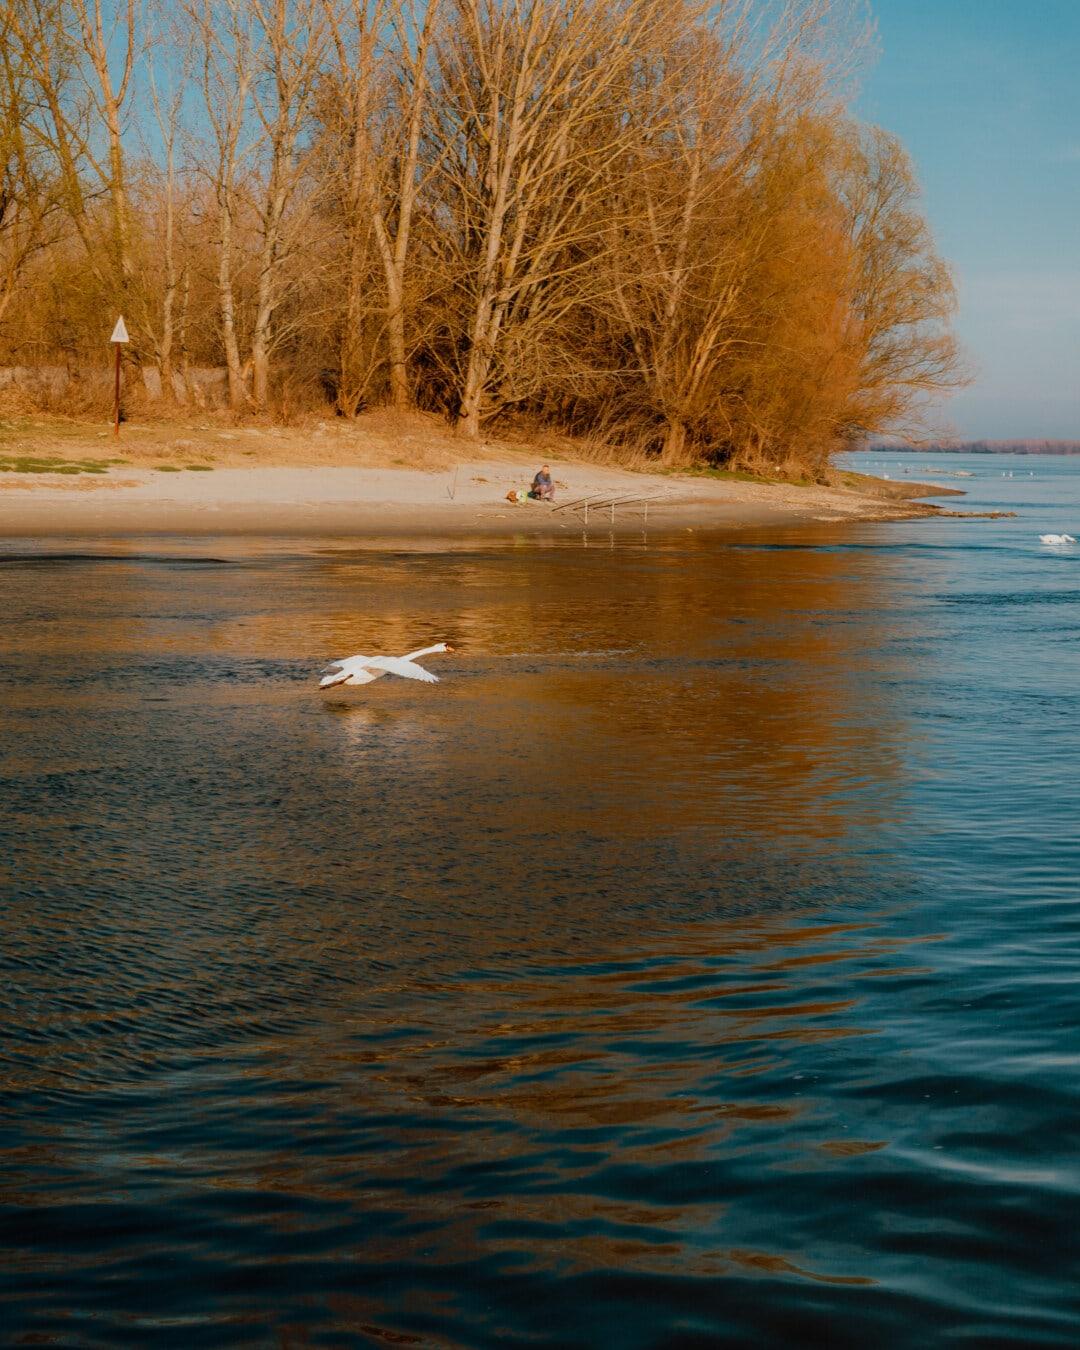 flying, swan, overflight, river, beach, landscape, dawn, water, reflection, sunset